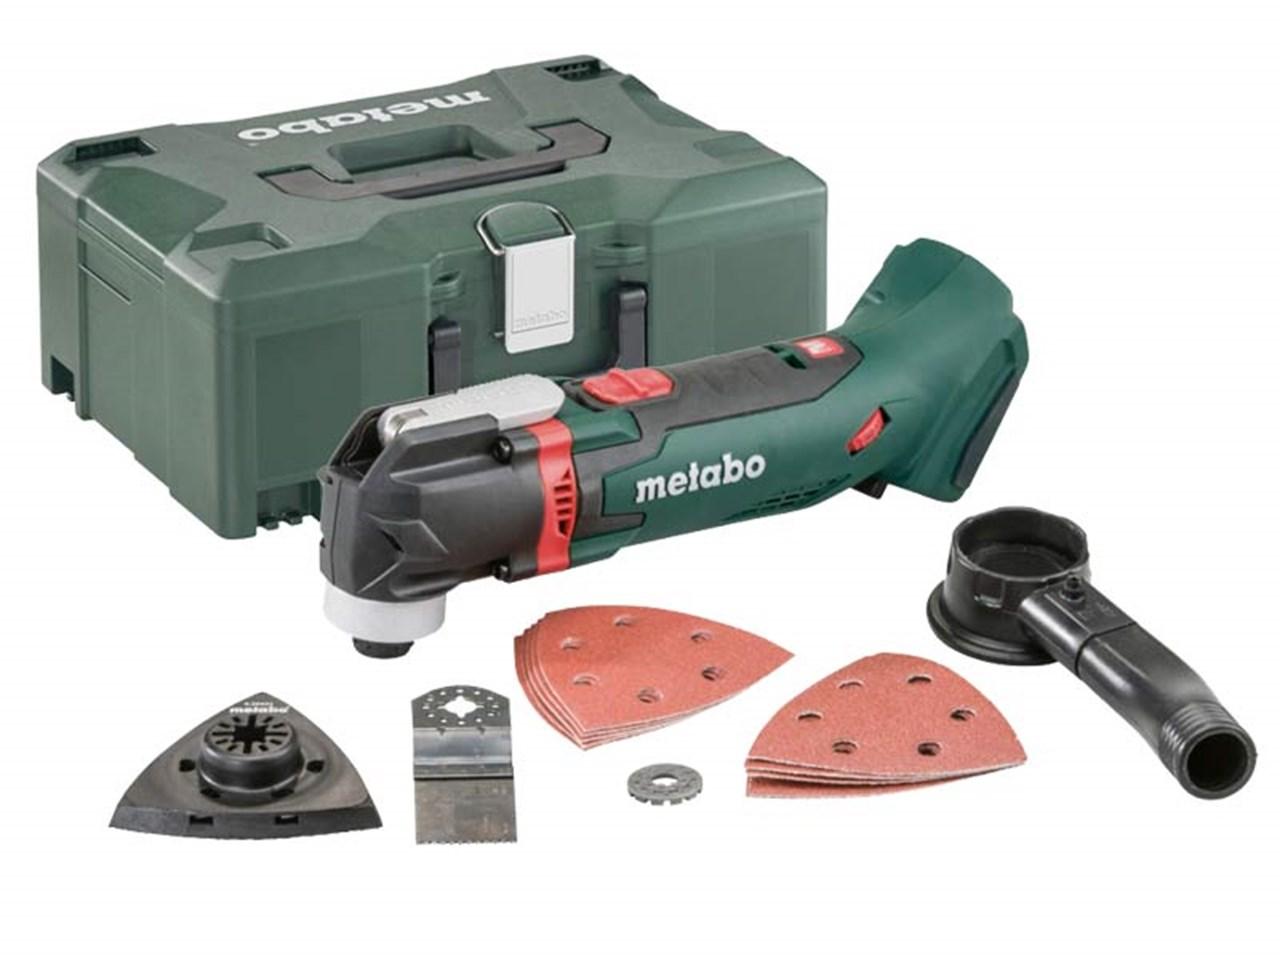 metabo mt18ltx 18v multi tool bare unit and metaloc